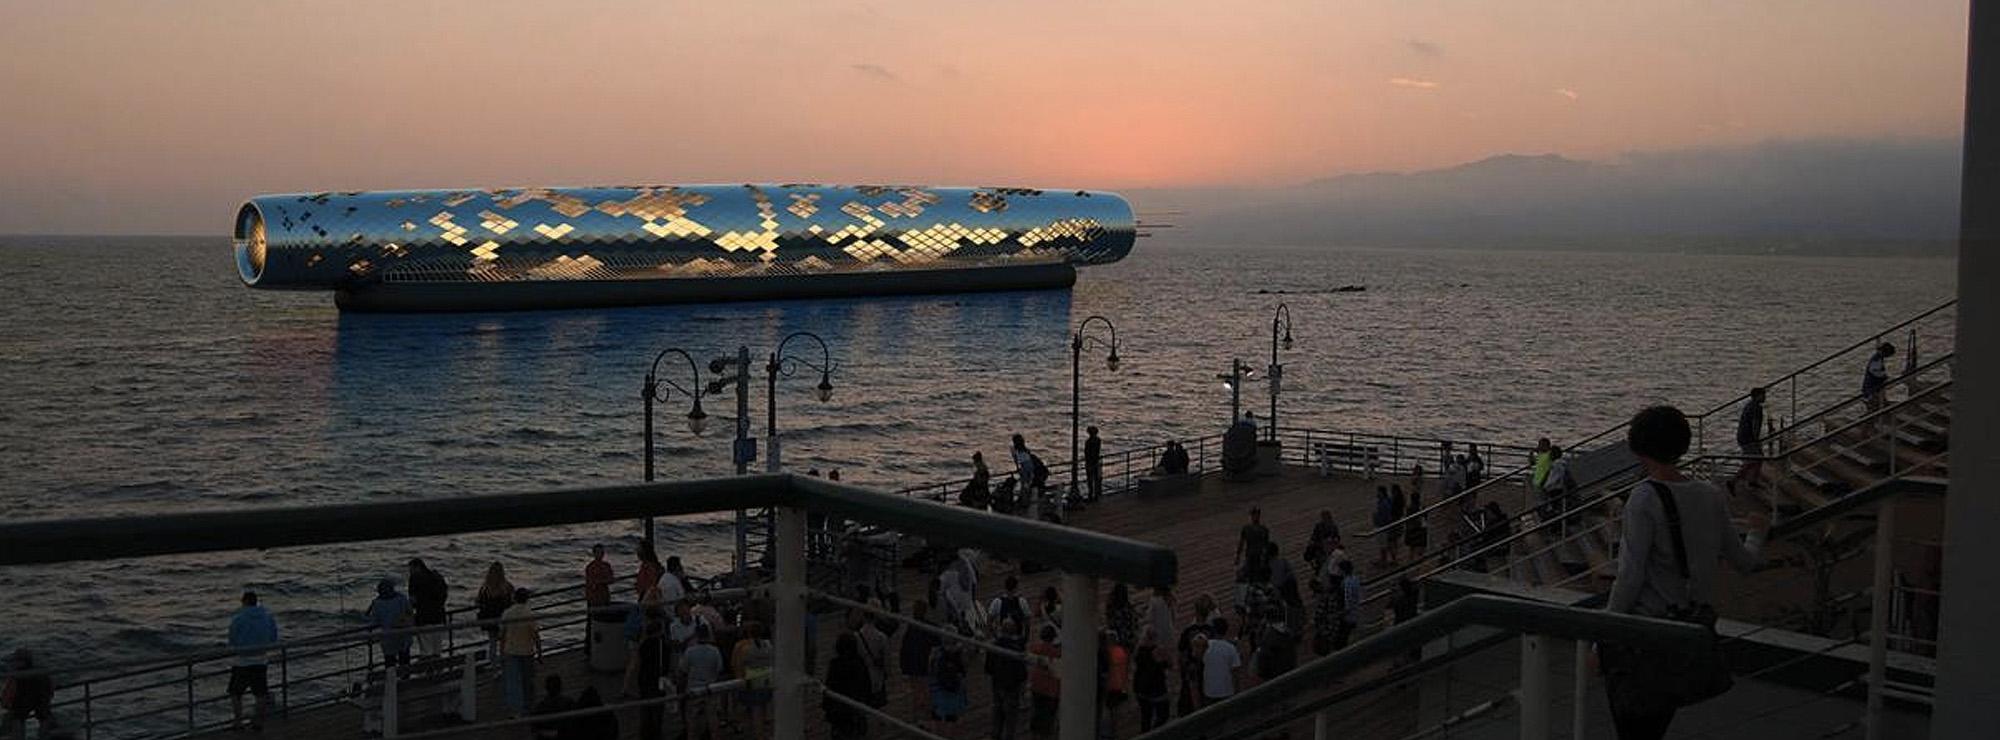 Californian sculpture desalinates 1.5 billion gallons of drinking water – Fanatical Futurist by International Keynote Speaker Matthew Griffin